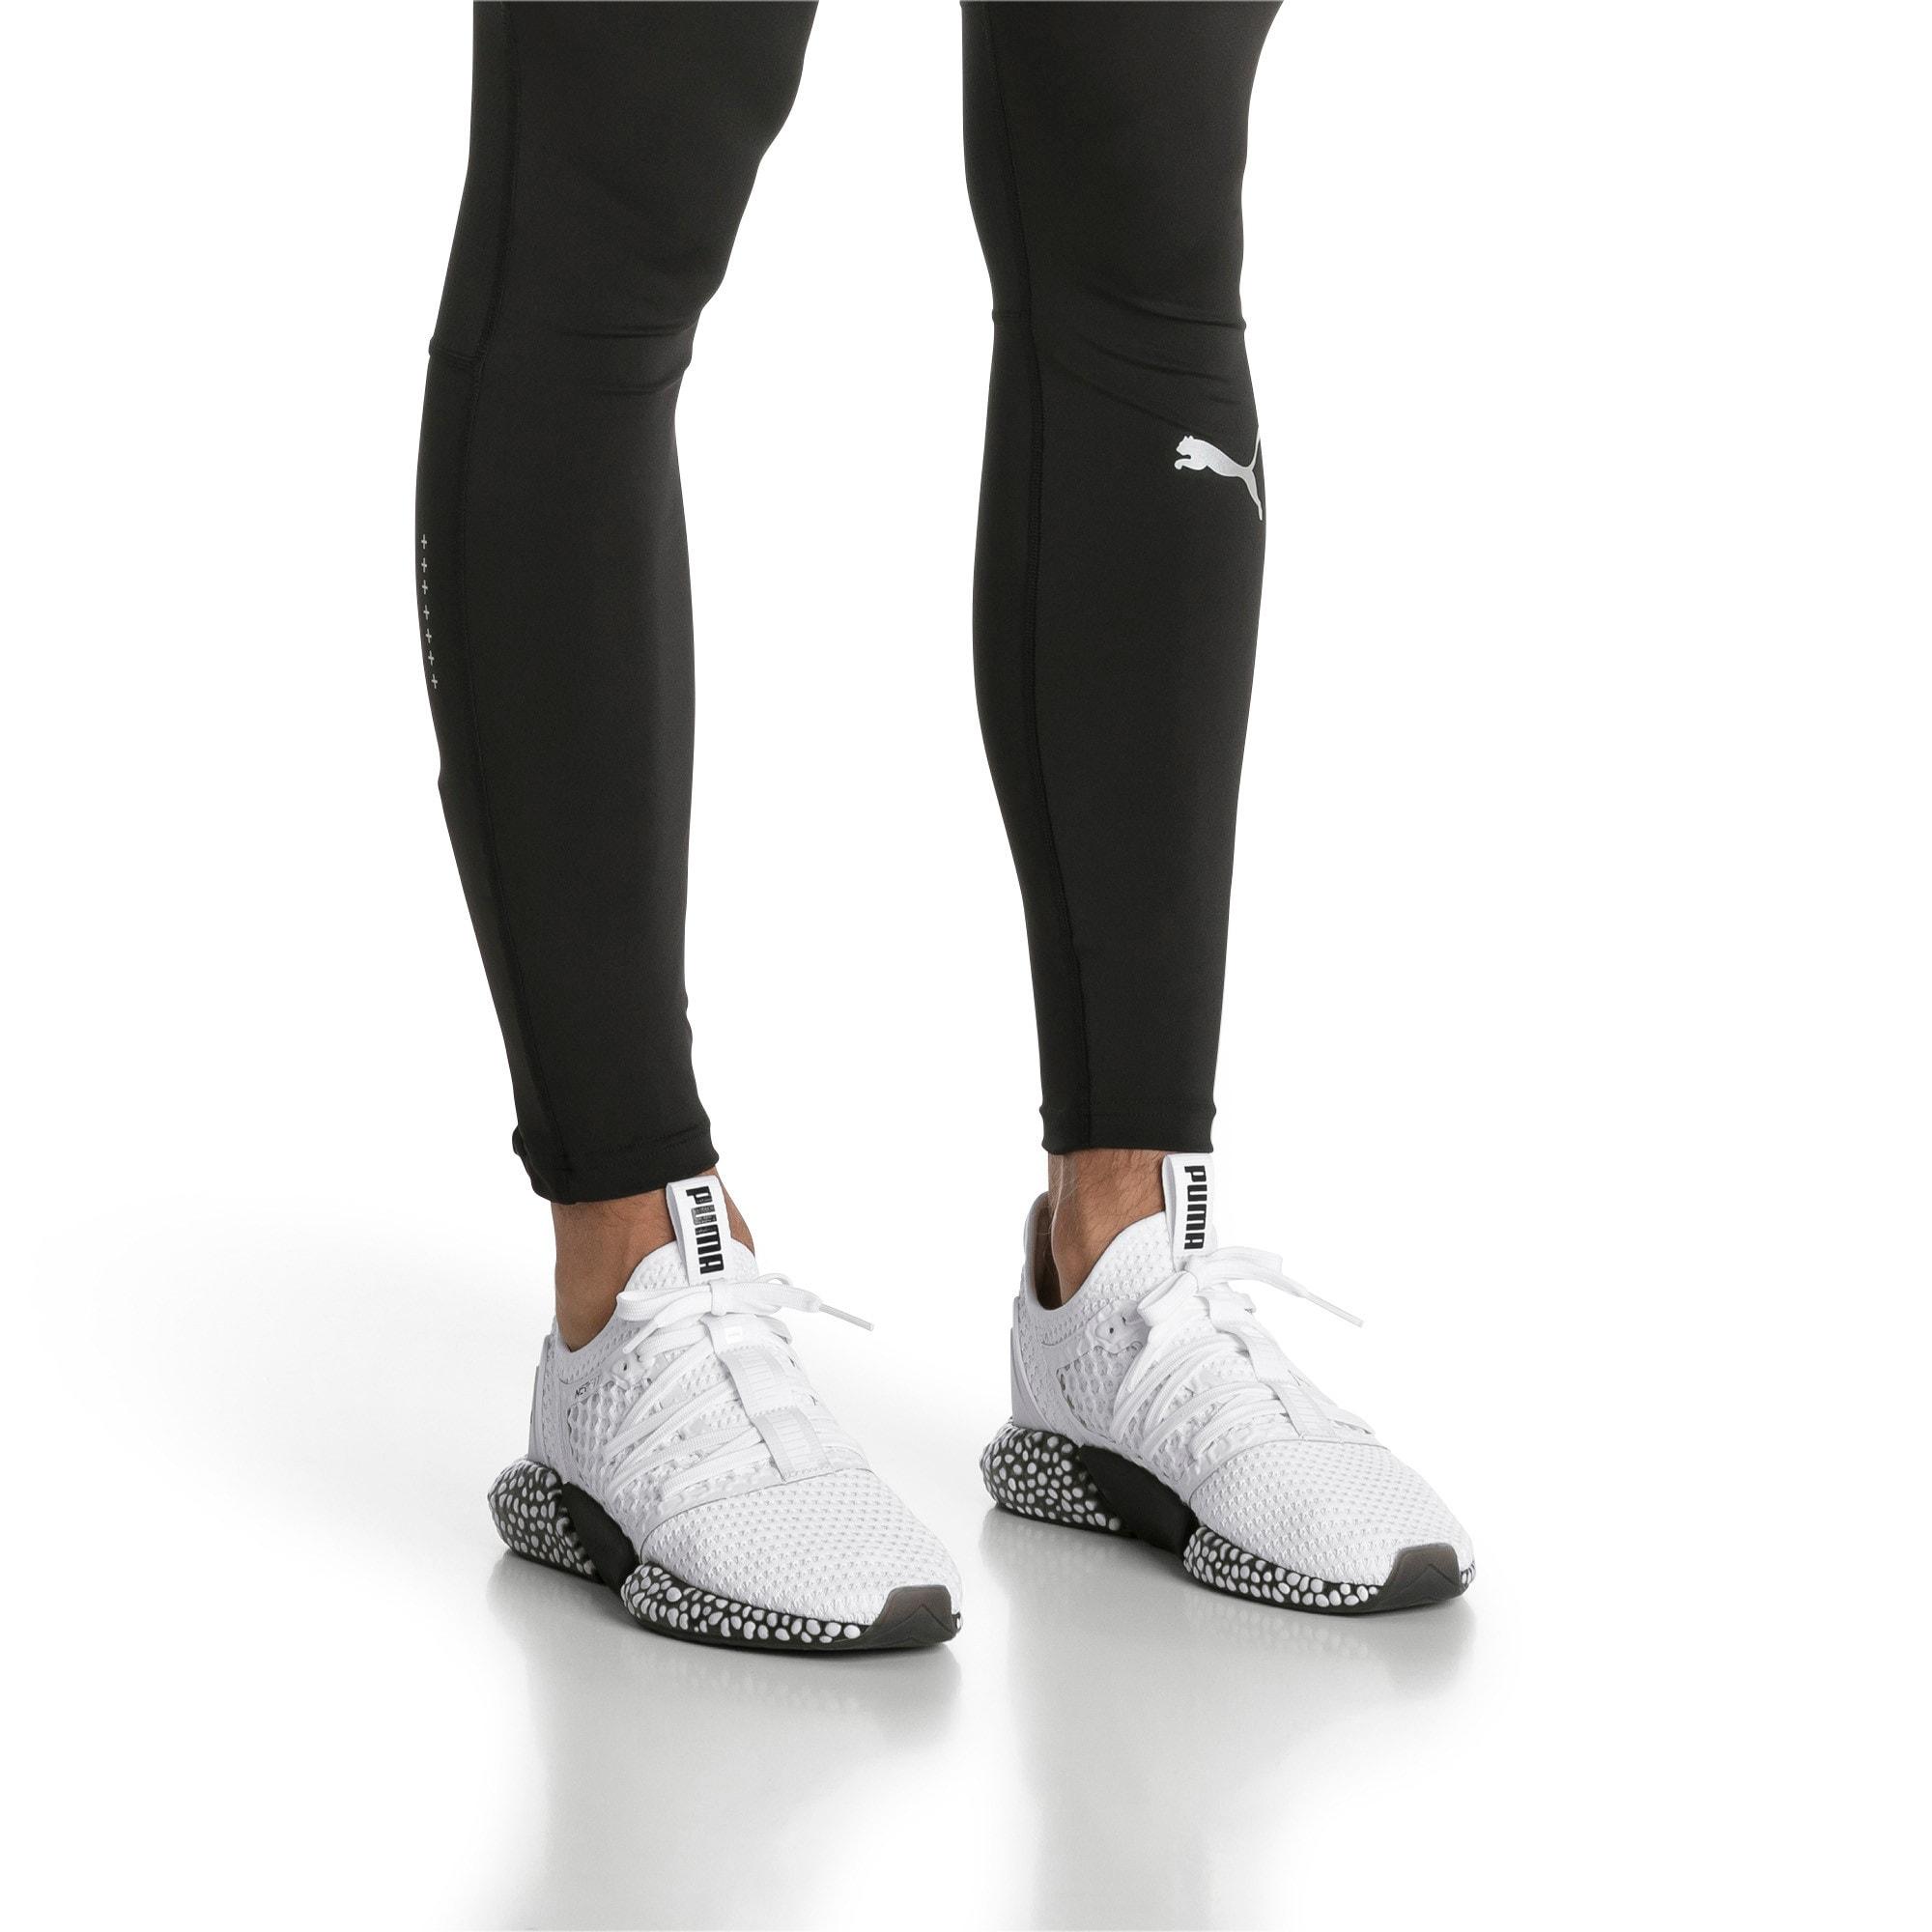 Thumbnail 8 of Hybrid Rocket NETFIT Men's Training Shoes, Puma White-Puma Black, medium